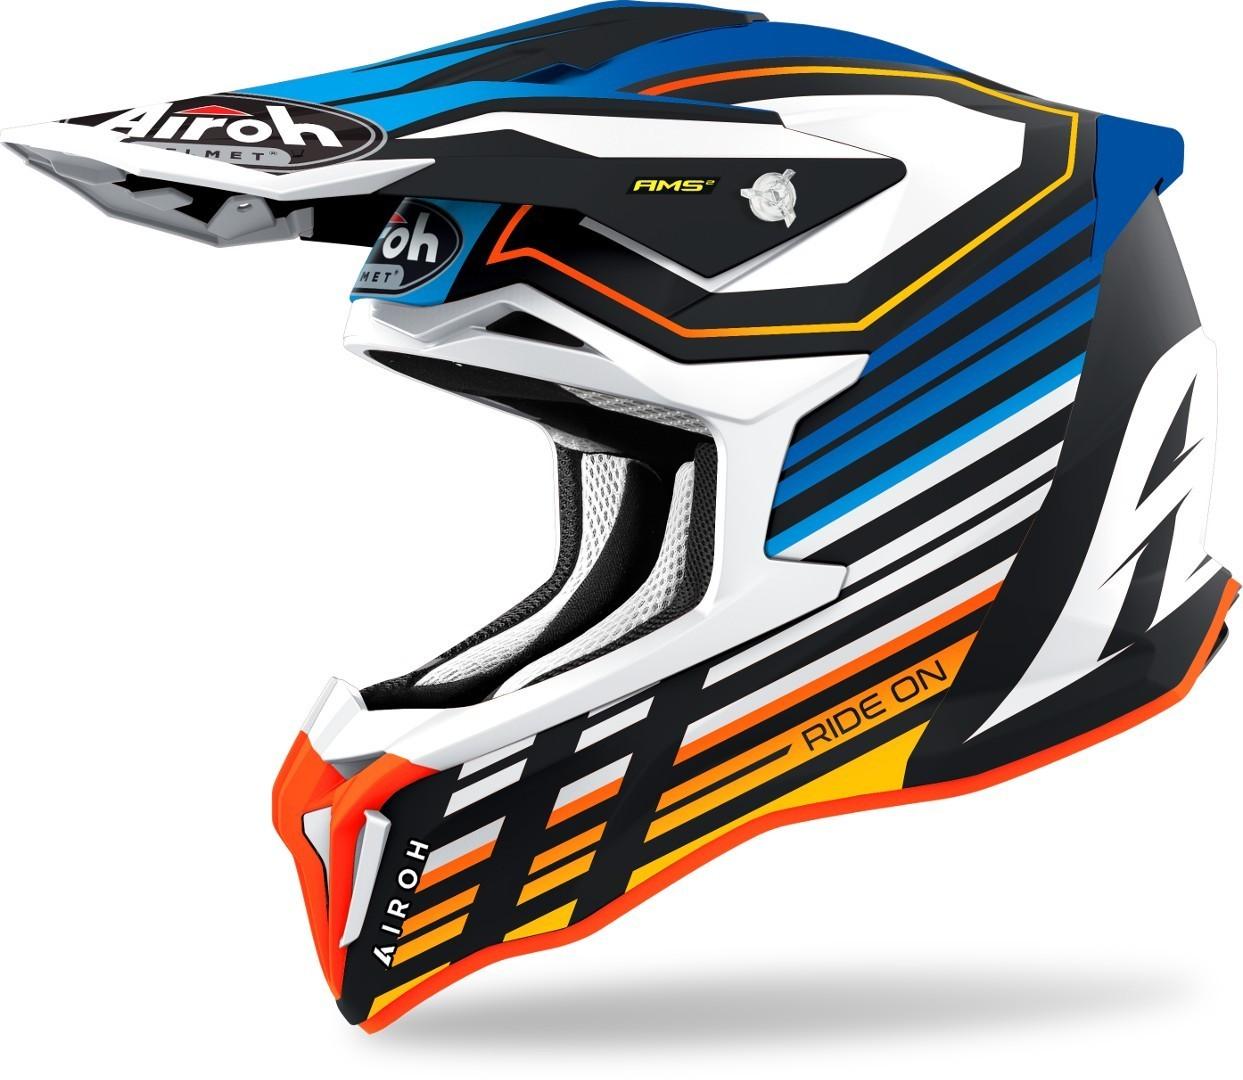 Airoh Strycker Shaded Carbon Motocross Helm, blau, Größe S, blau, Größe S